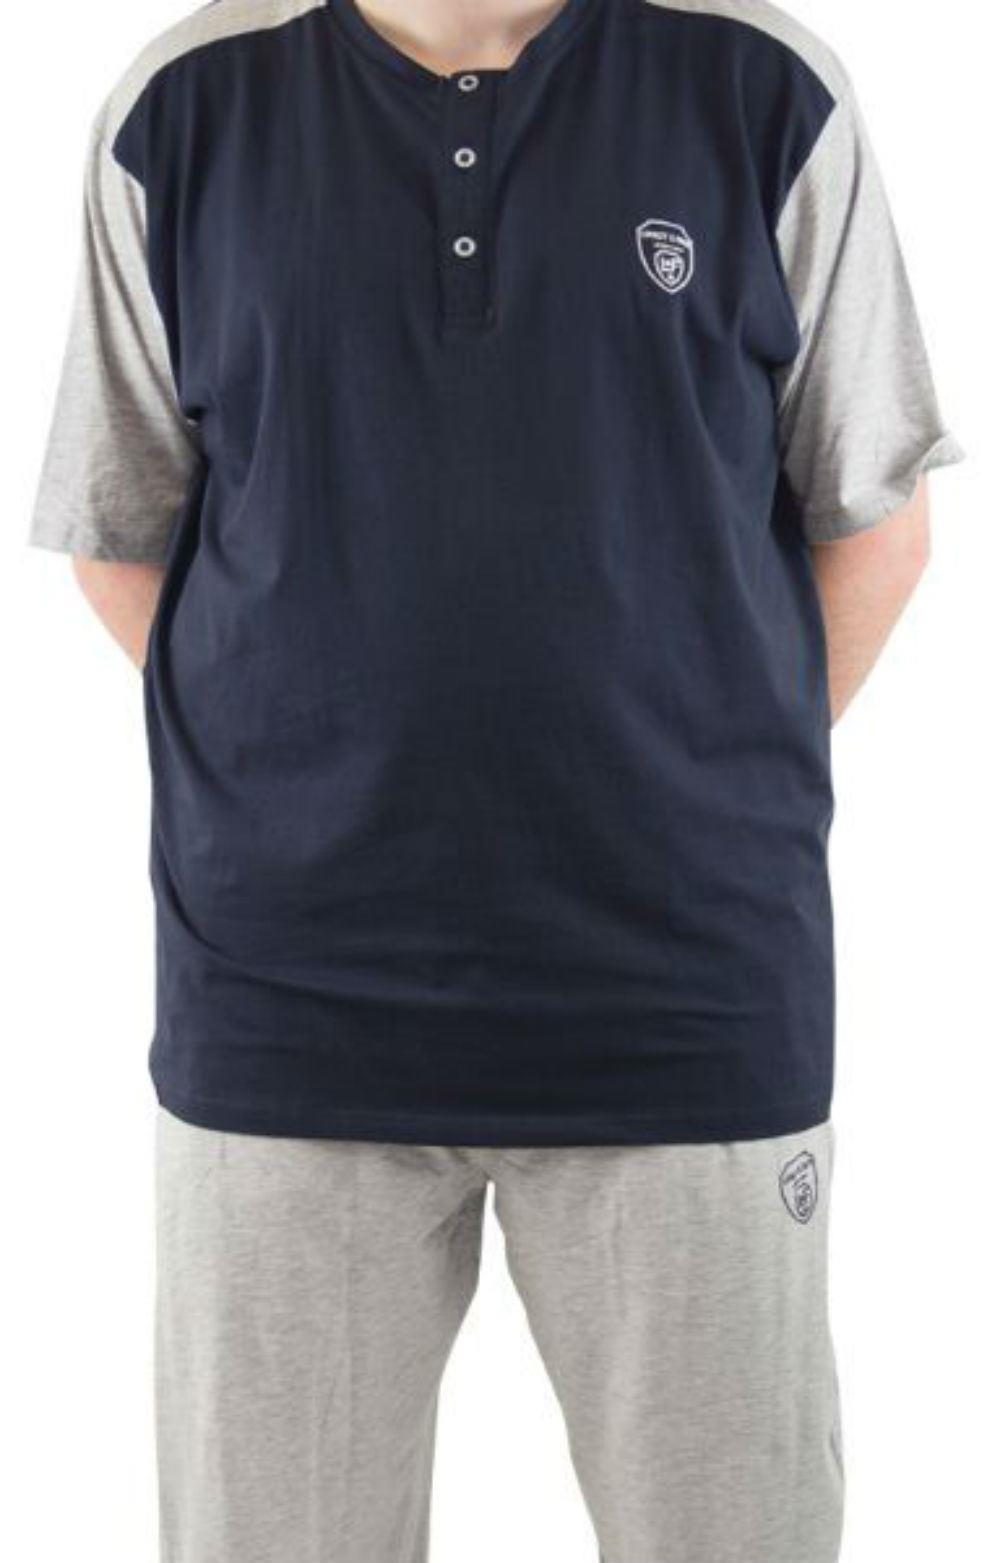 Loyalty and Faith Seattle Top & Bottom Loungewear Set Navy & Grey|2XL